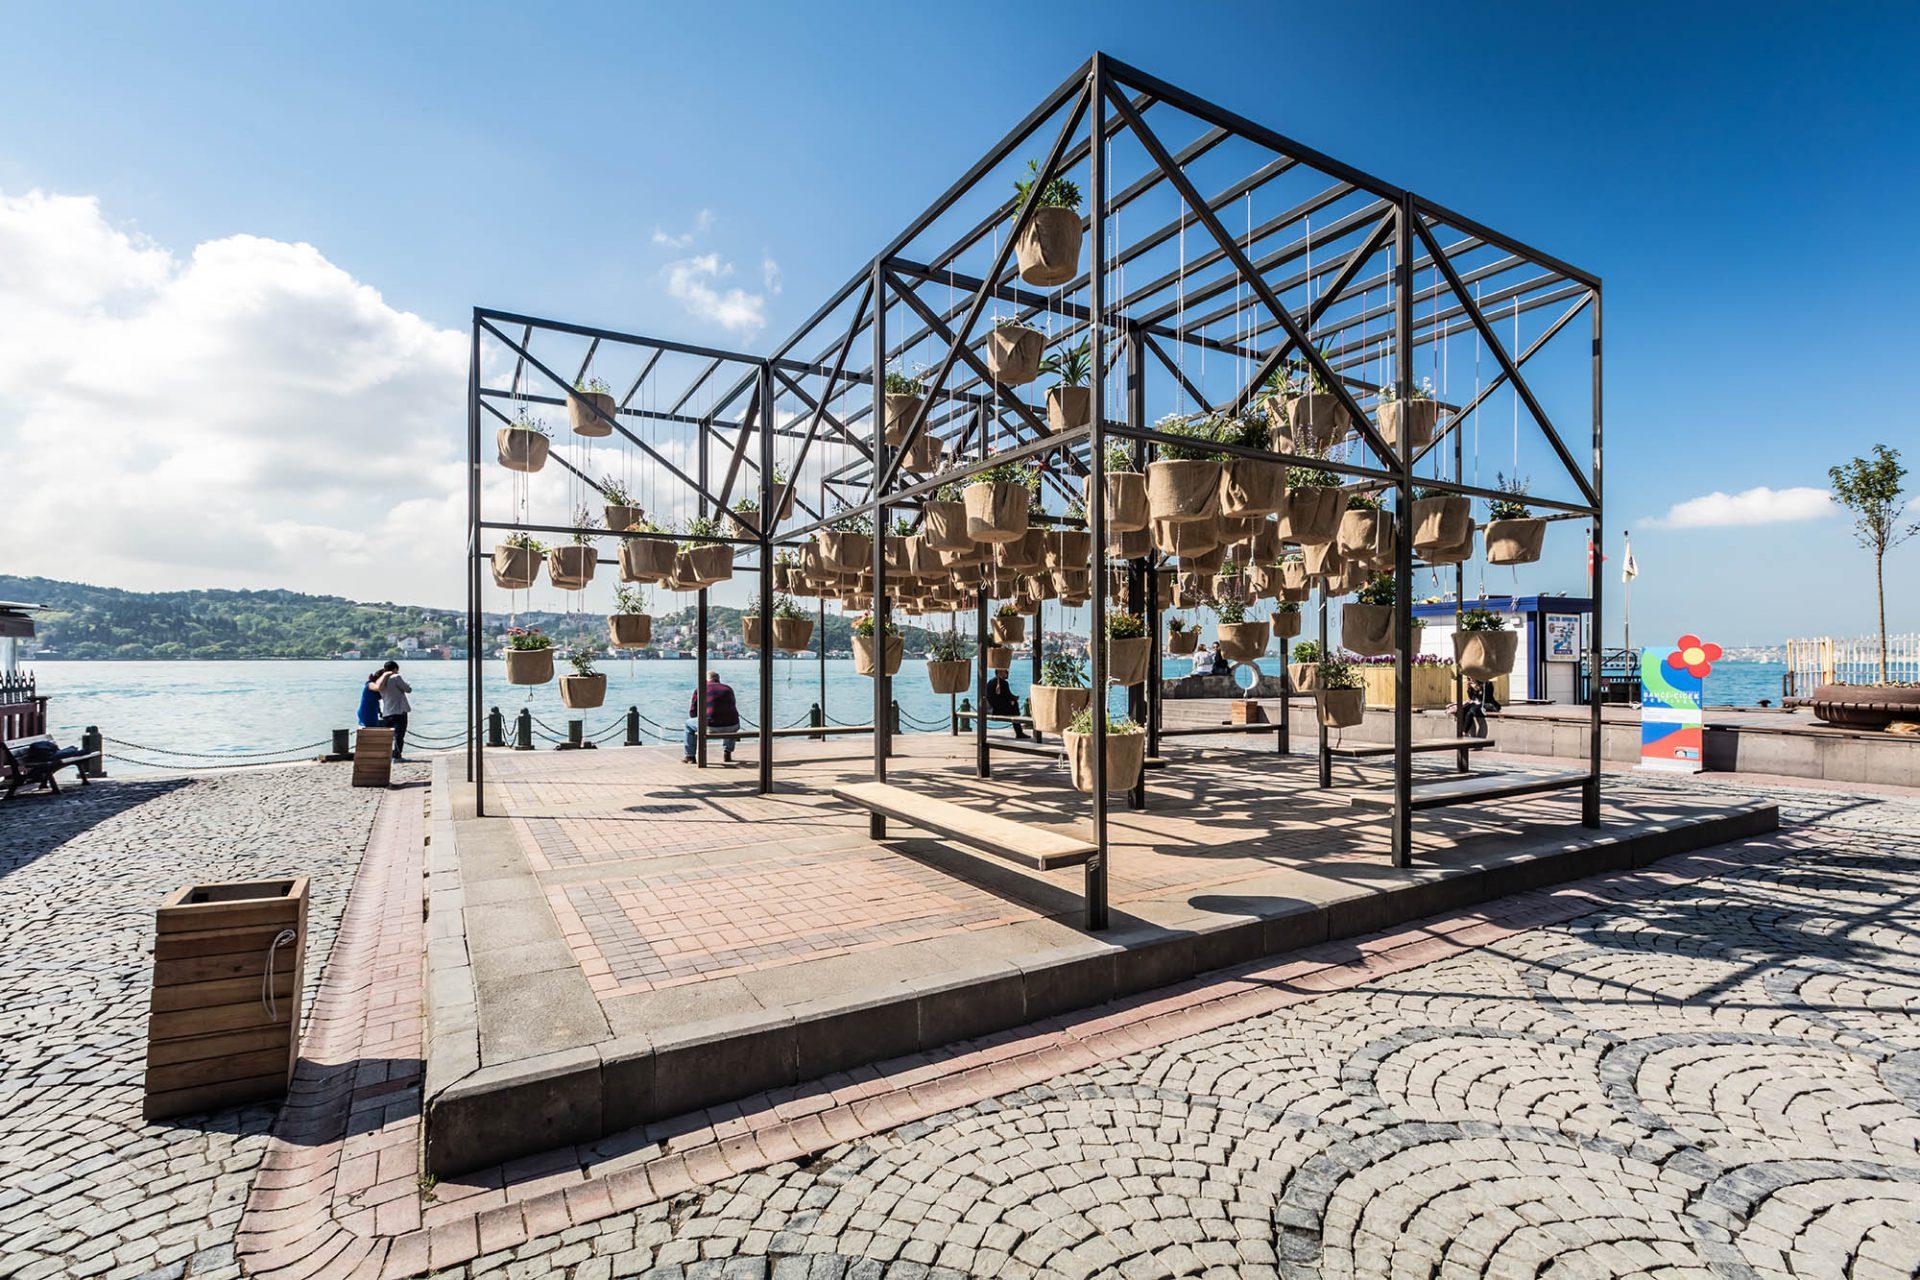 Flying Garden by SO?. Type: Public Installation. Size: 60m2. Location: İstanbul. Client: Beşiktaş Belediyesi. Status: Built, 2016